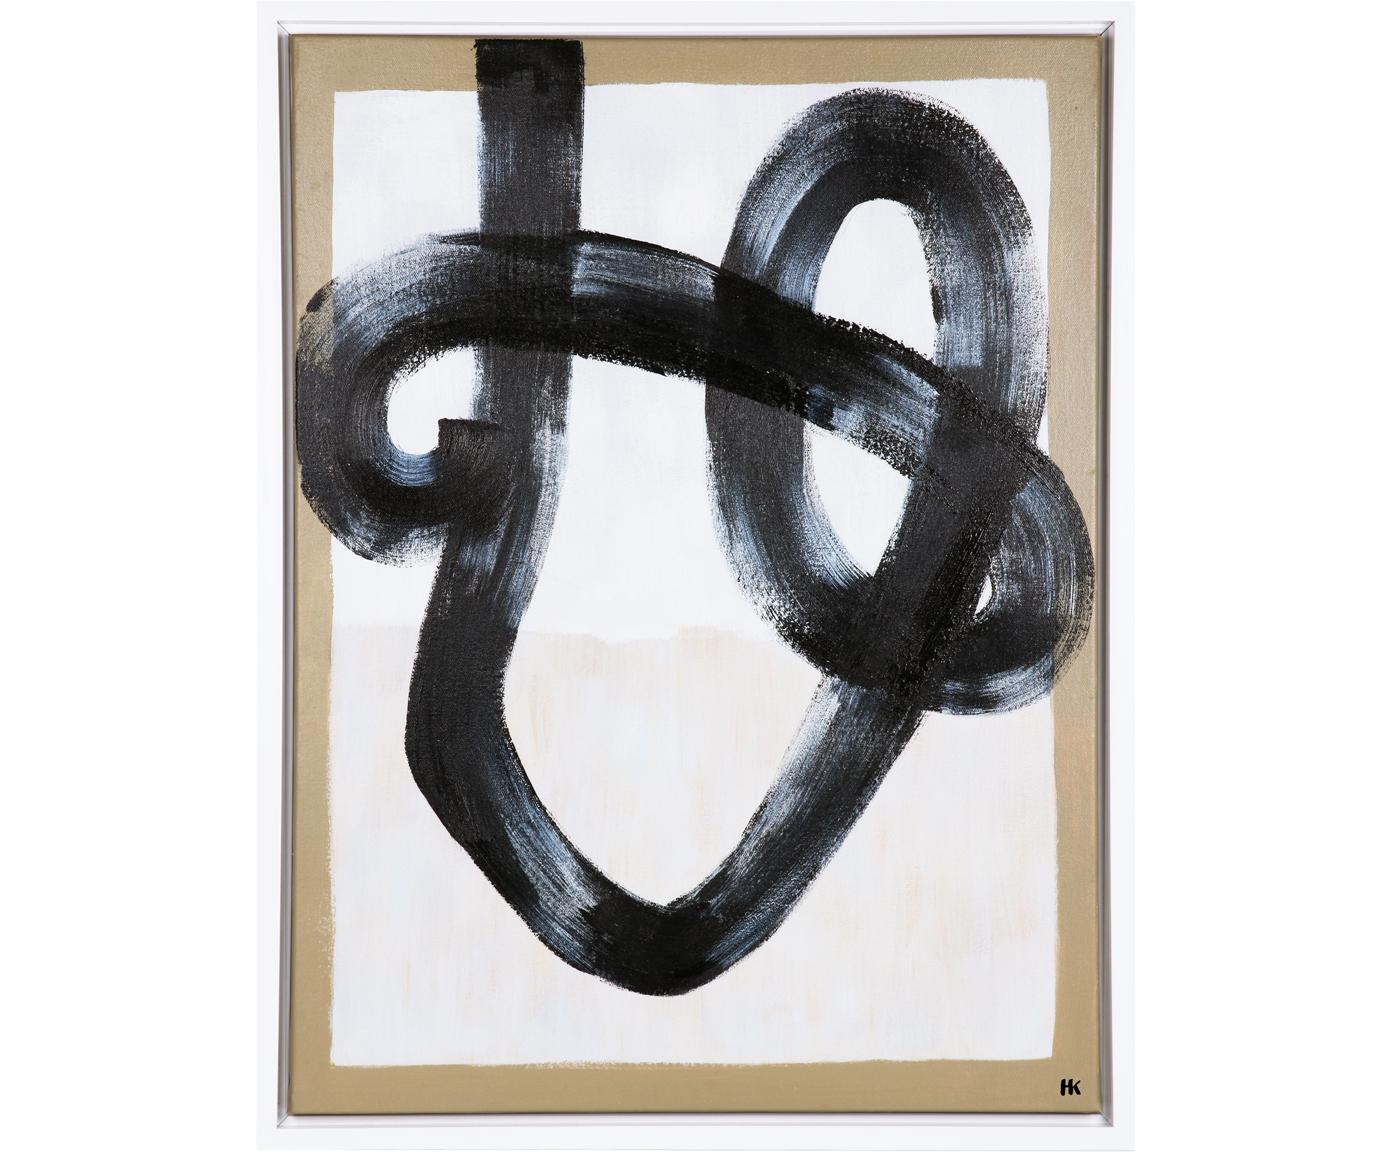 Gerahmtes Leinwandbild Brush, Rahmen: Holz, beschichtet, Bild: Textil, Front: Acryl, Weiß, Schwarz, Beige, 60 x 80 cm